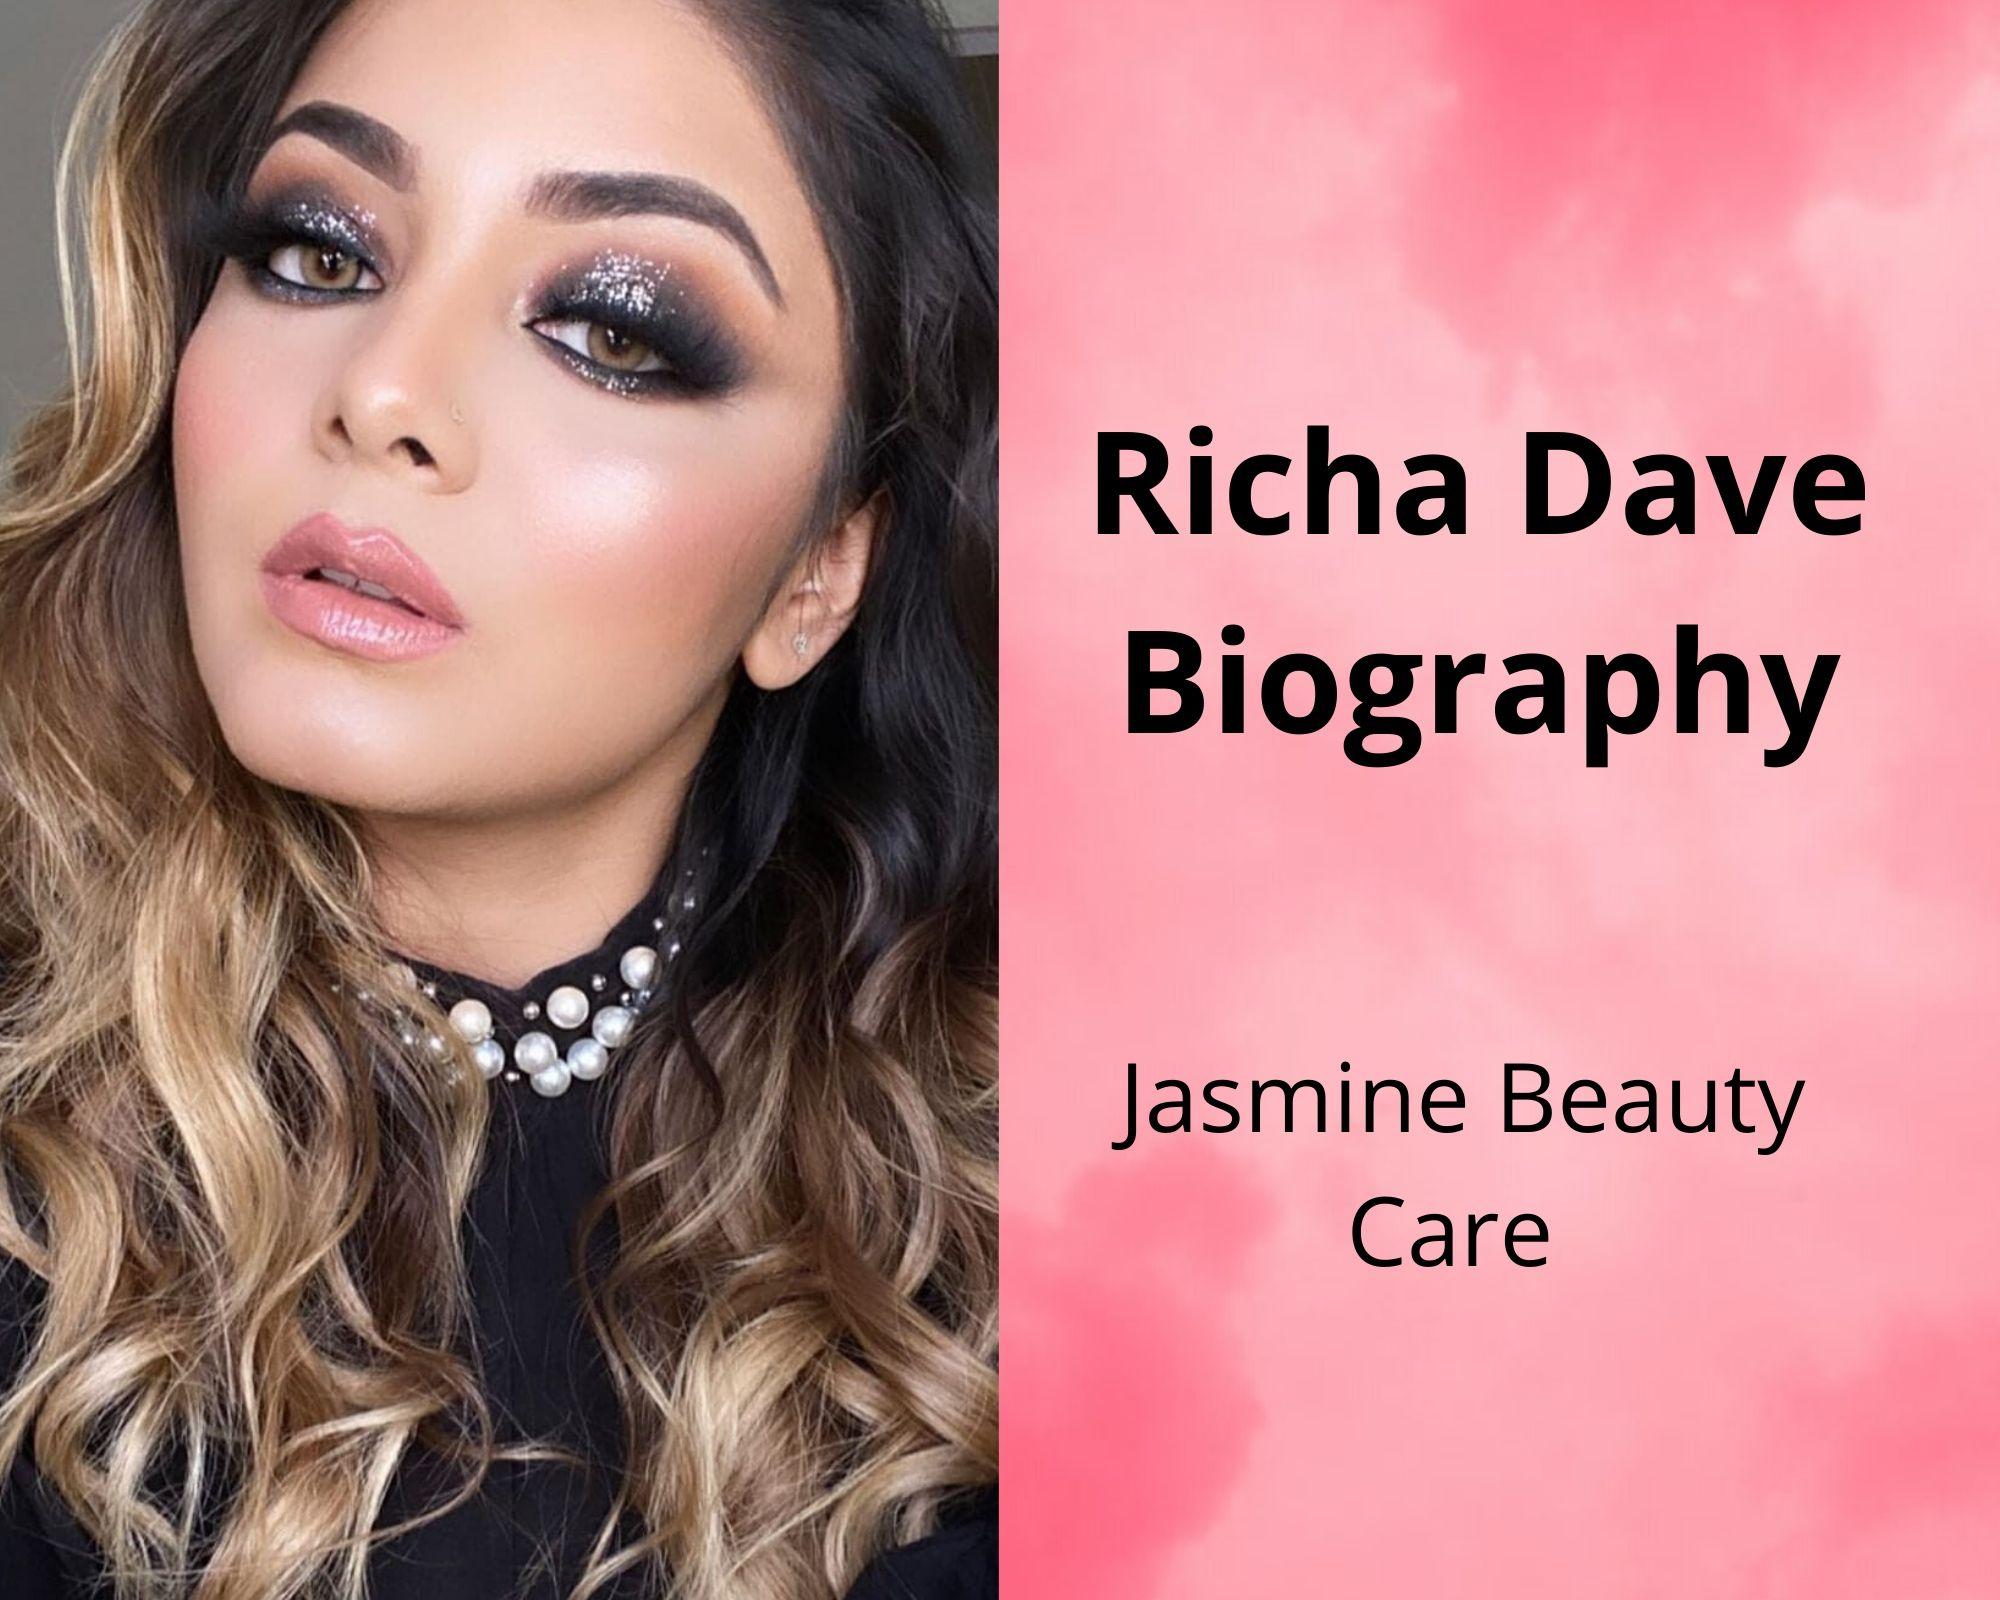 Richa Dave Biography